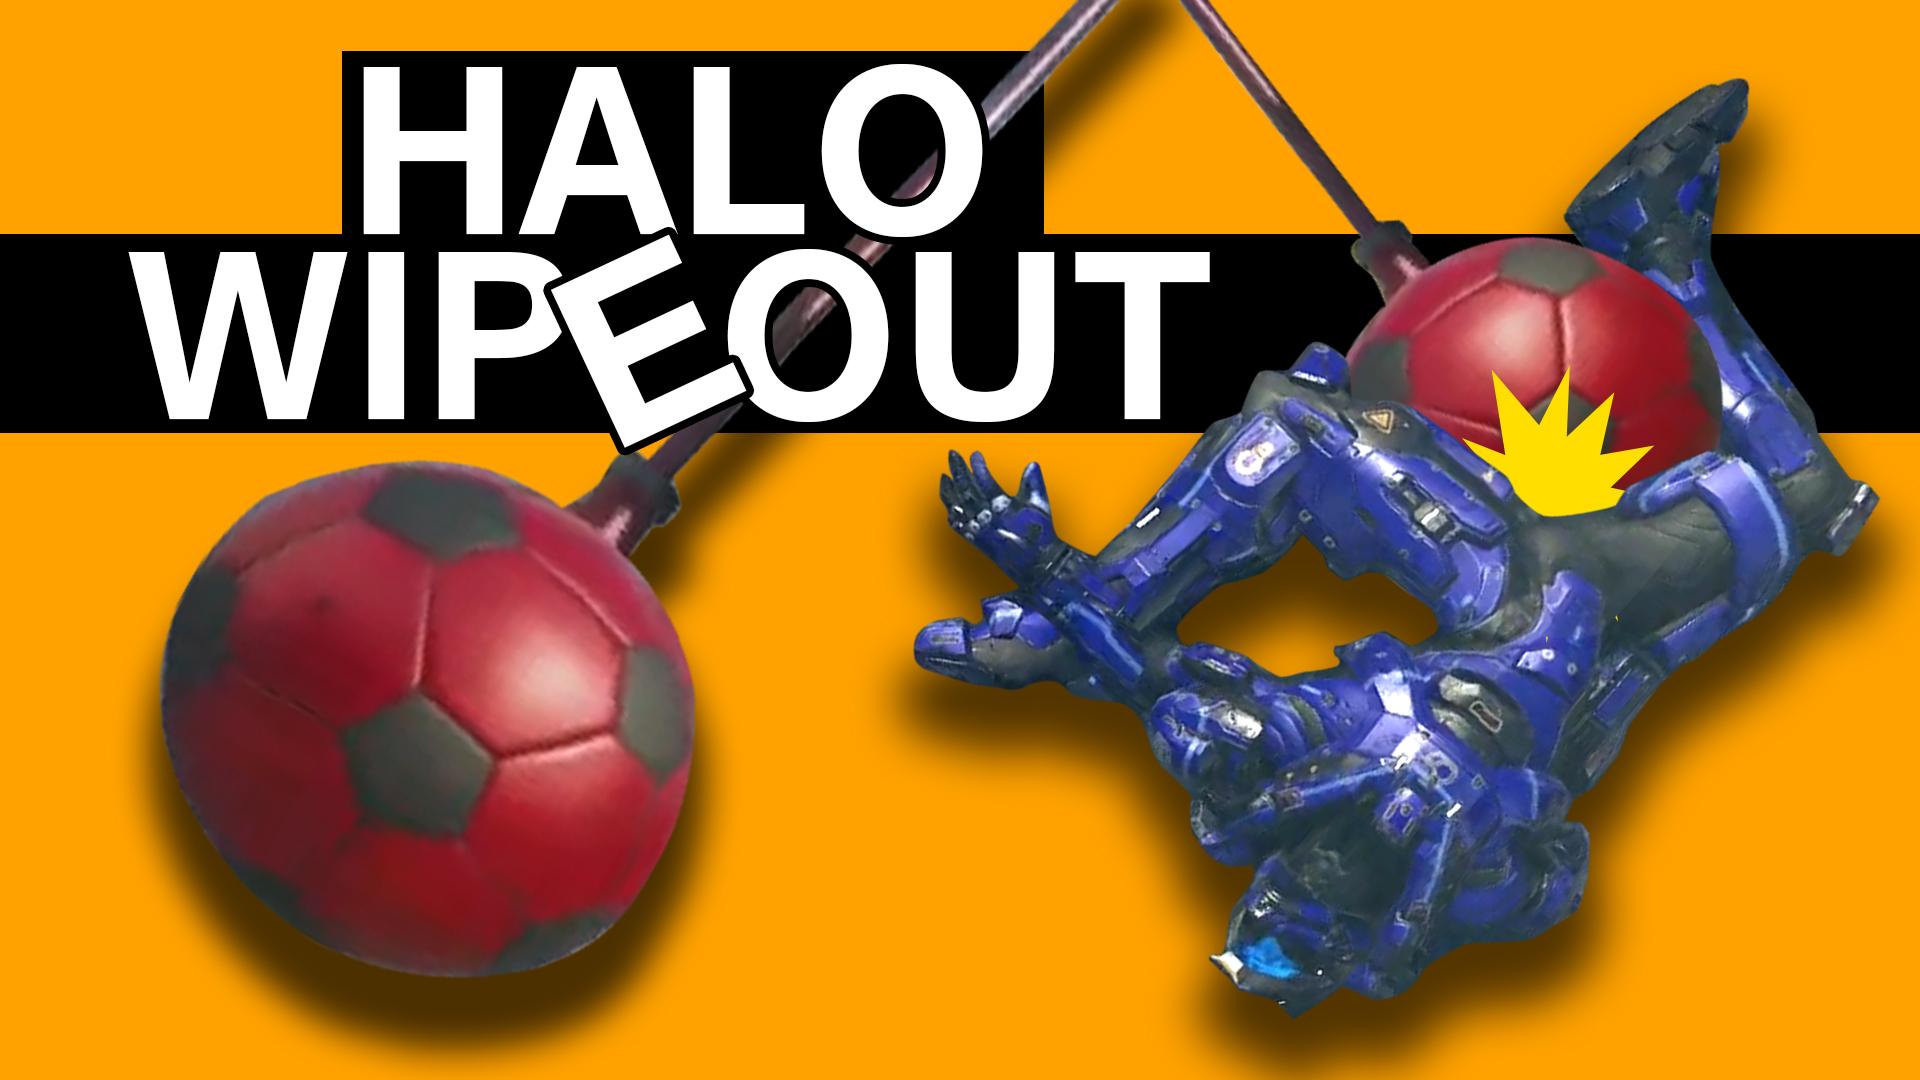 Wipeout Students Revenge Halo Wipeout V